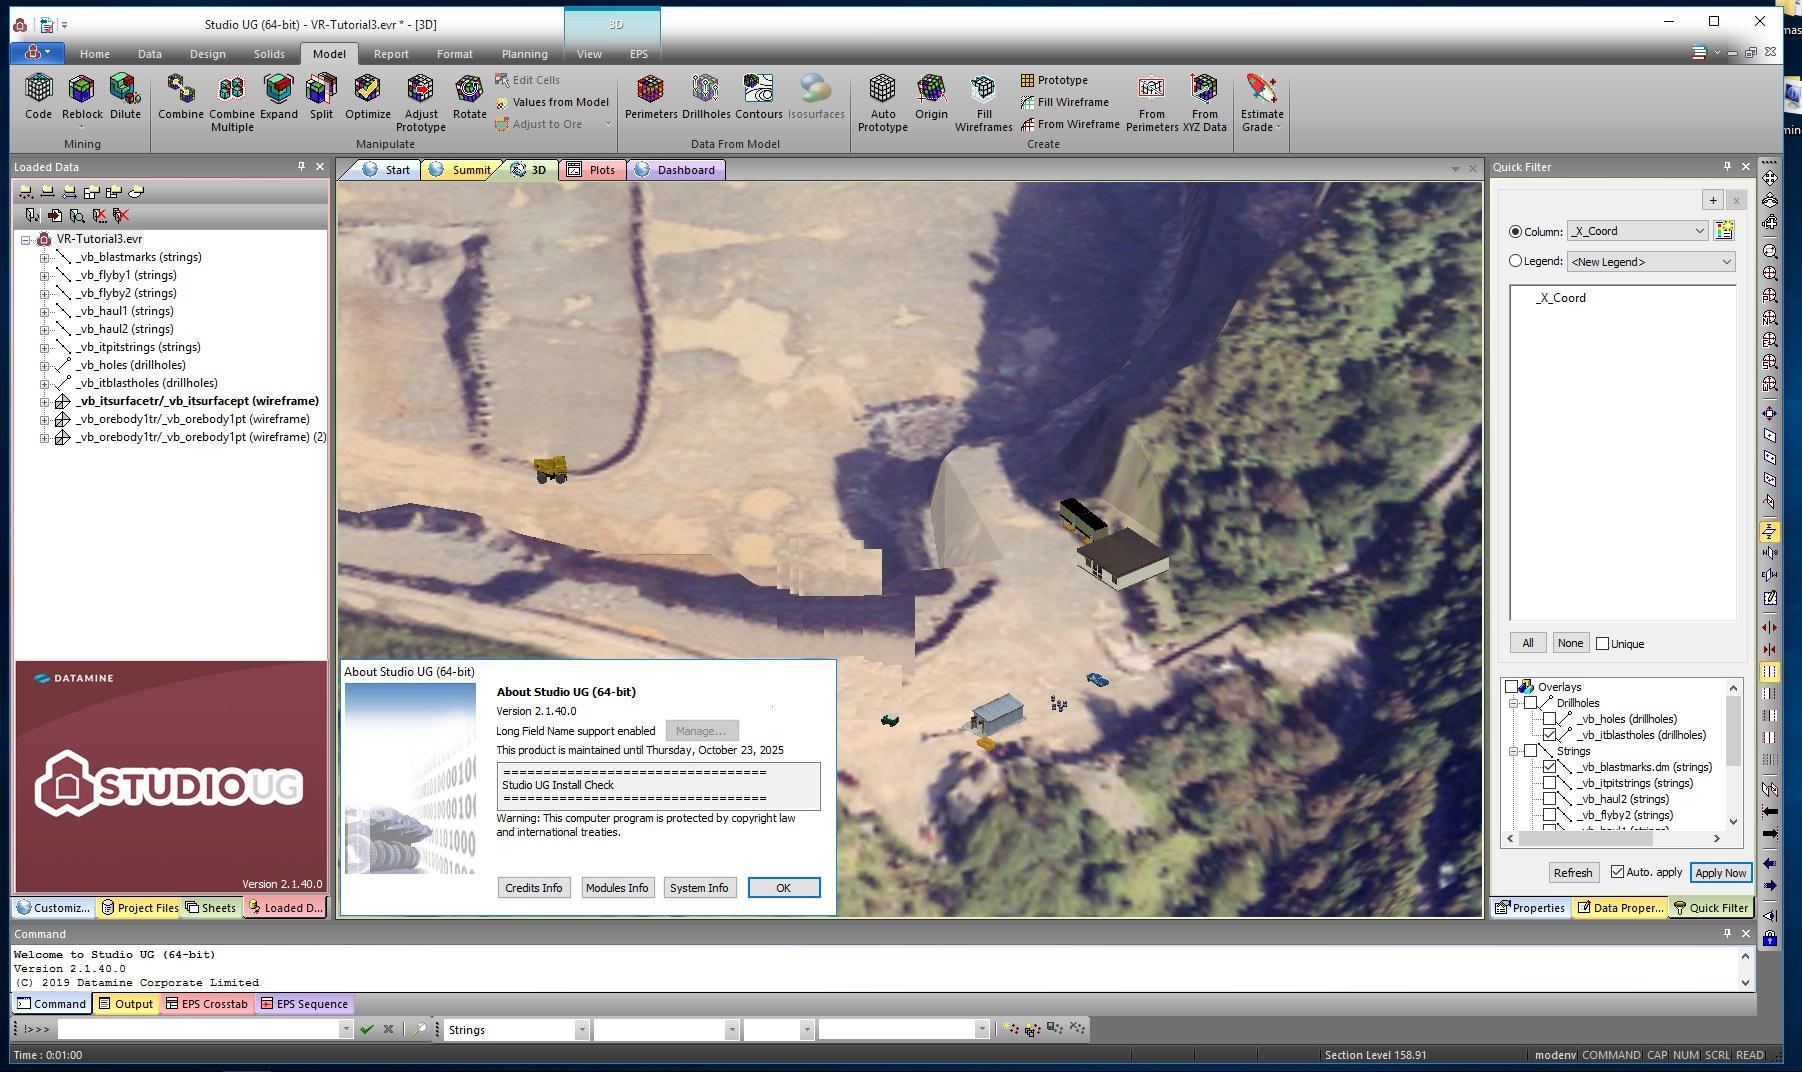 Working with Datamine Studio UG 2.1.40.0 full license